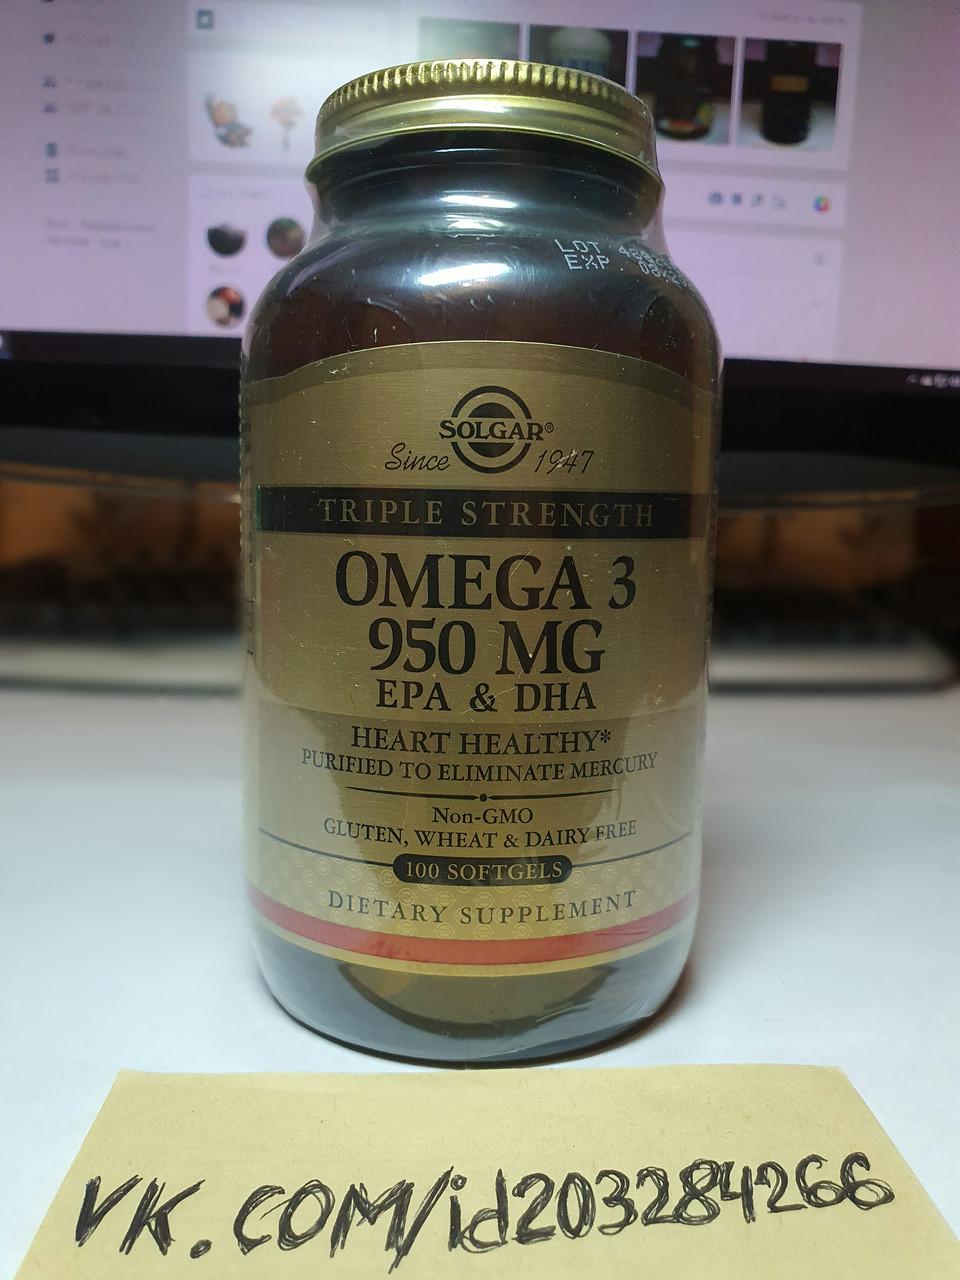 Солгар омега 3 Solgar Triple Strength Omega-3 950 mg 100 softgels рыбий жир жирные кислоты витамины